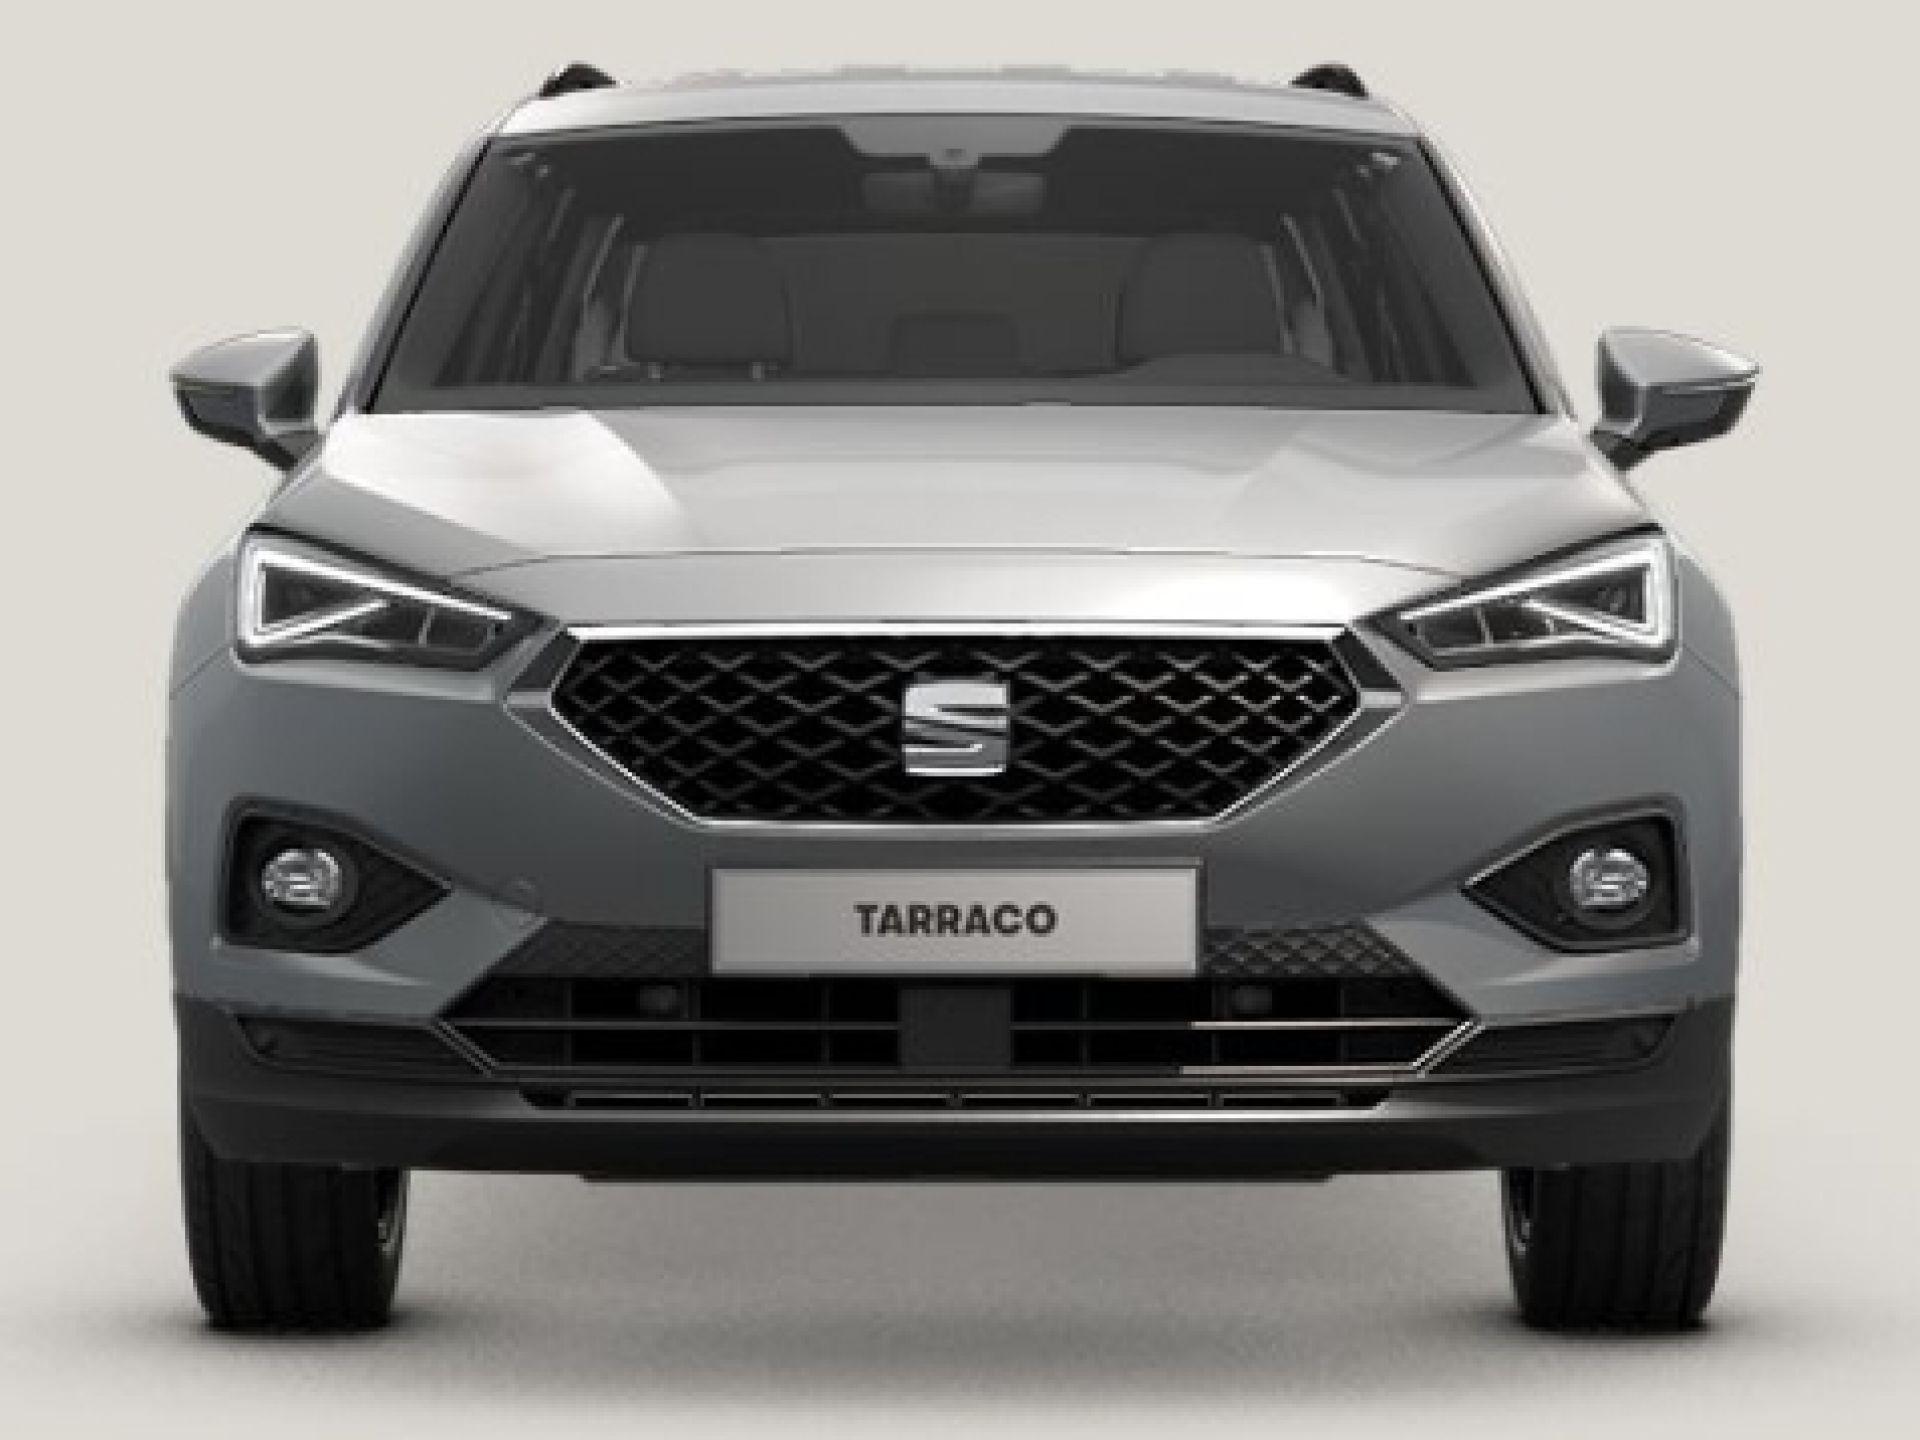 SEAT Tarraco 2.0 TDI 110kW (150CV) S&S Style Plus nuevo Madrid